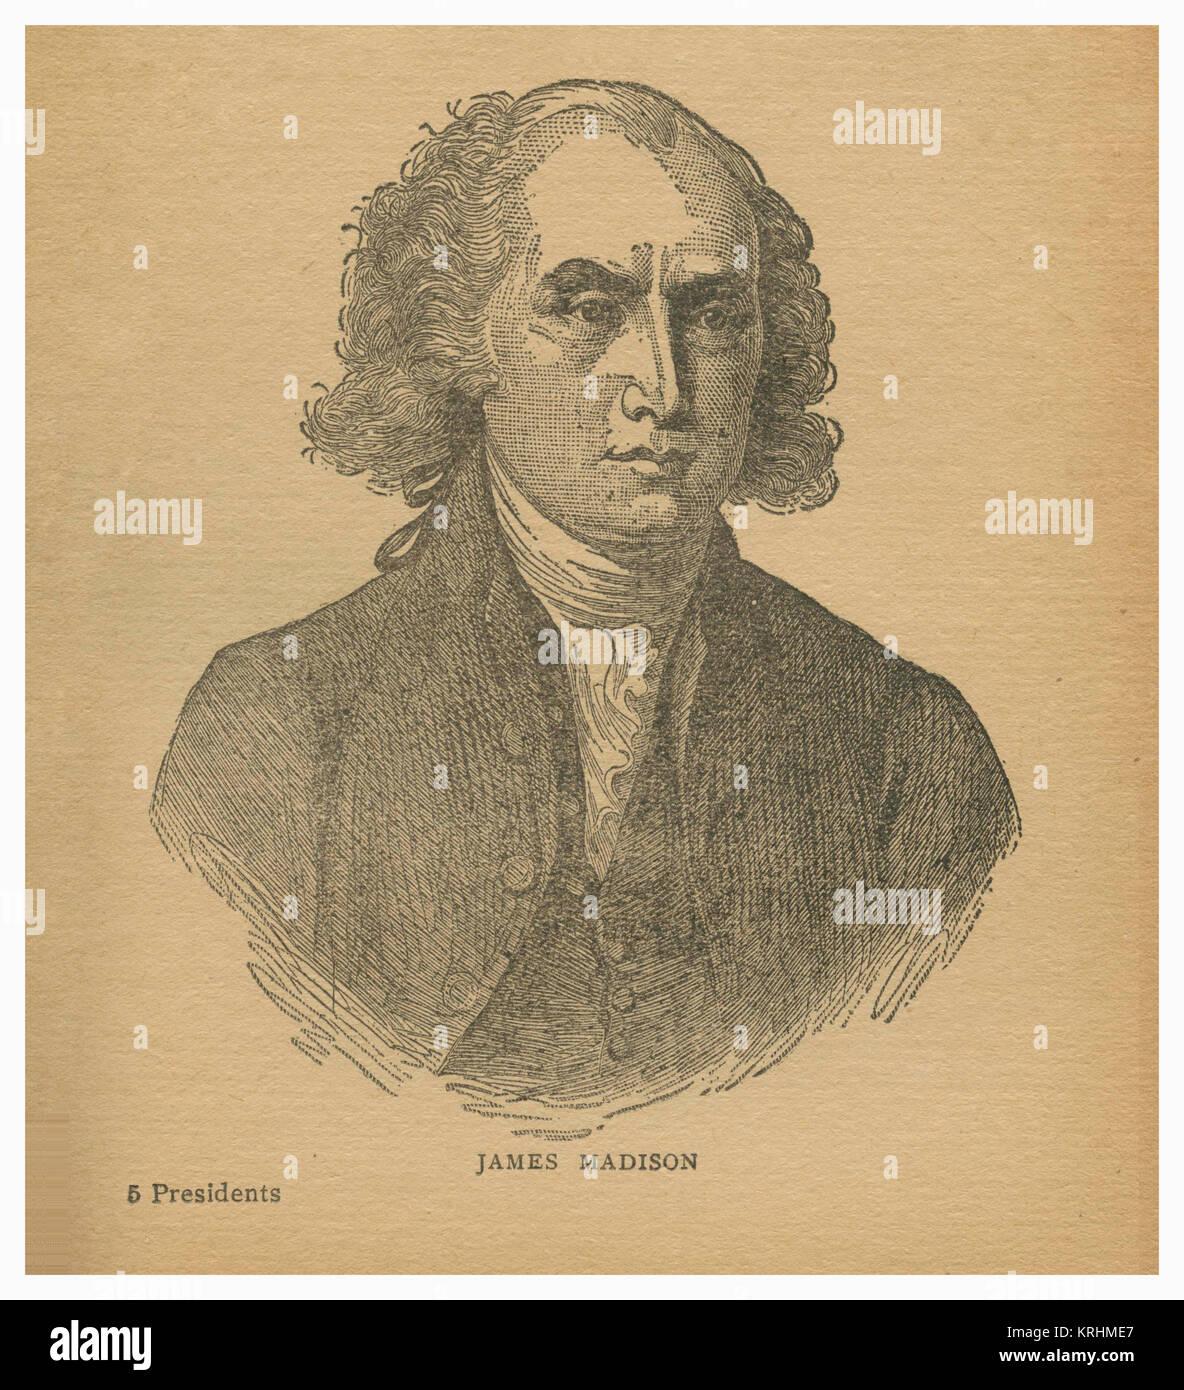 James Madison - Stock Image